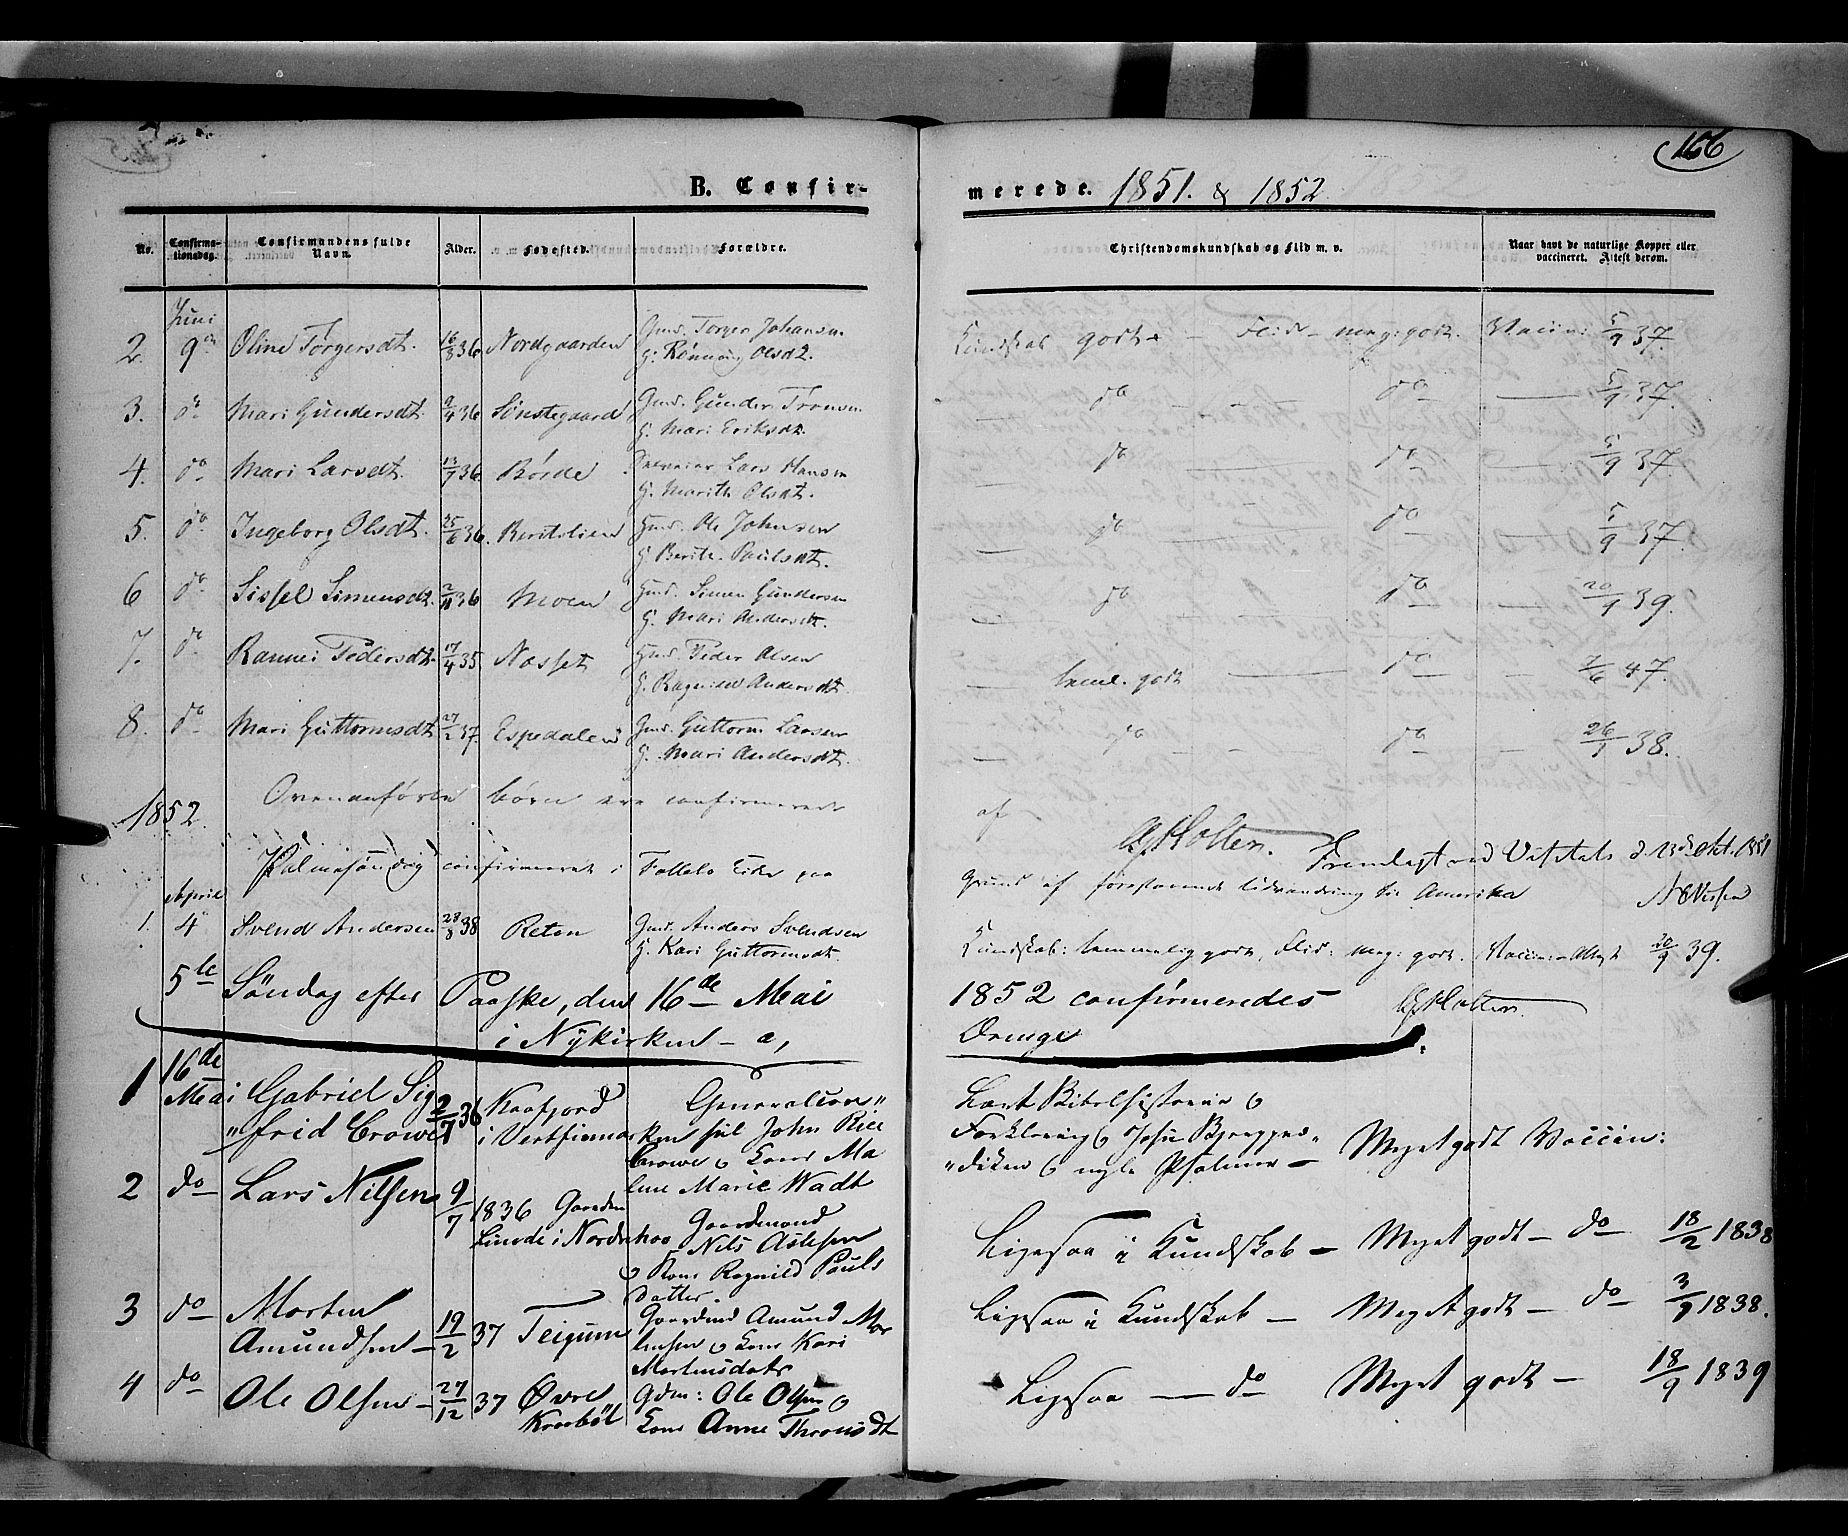 SAH, Gausdal prestekontor, Ministerialbok nr. 8, 1850-1861, s. 166